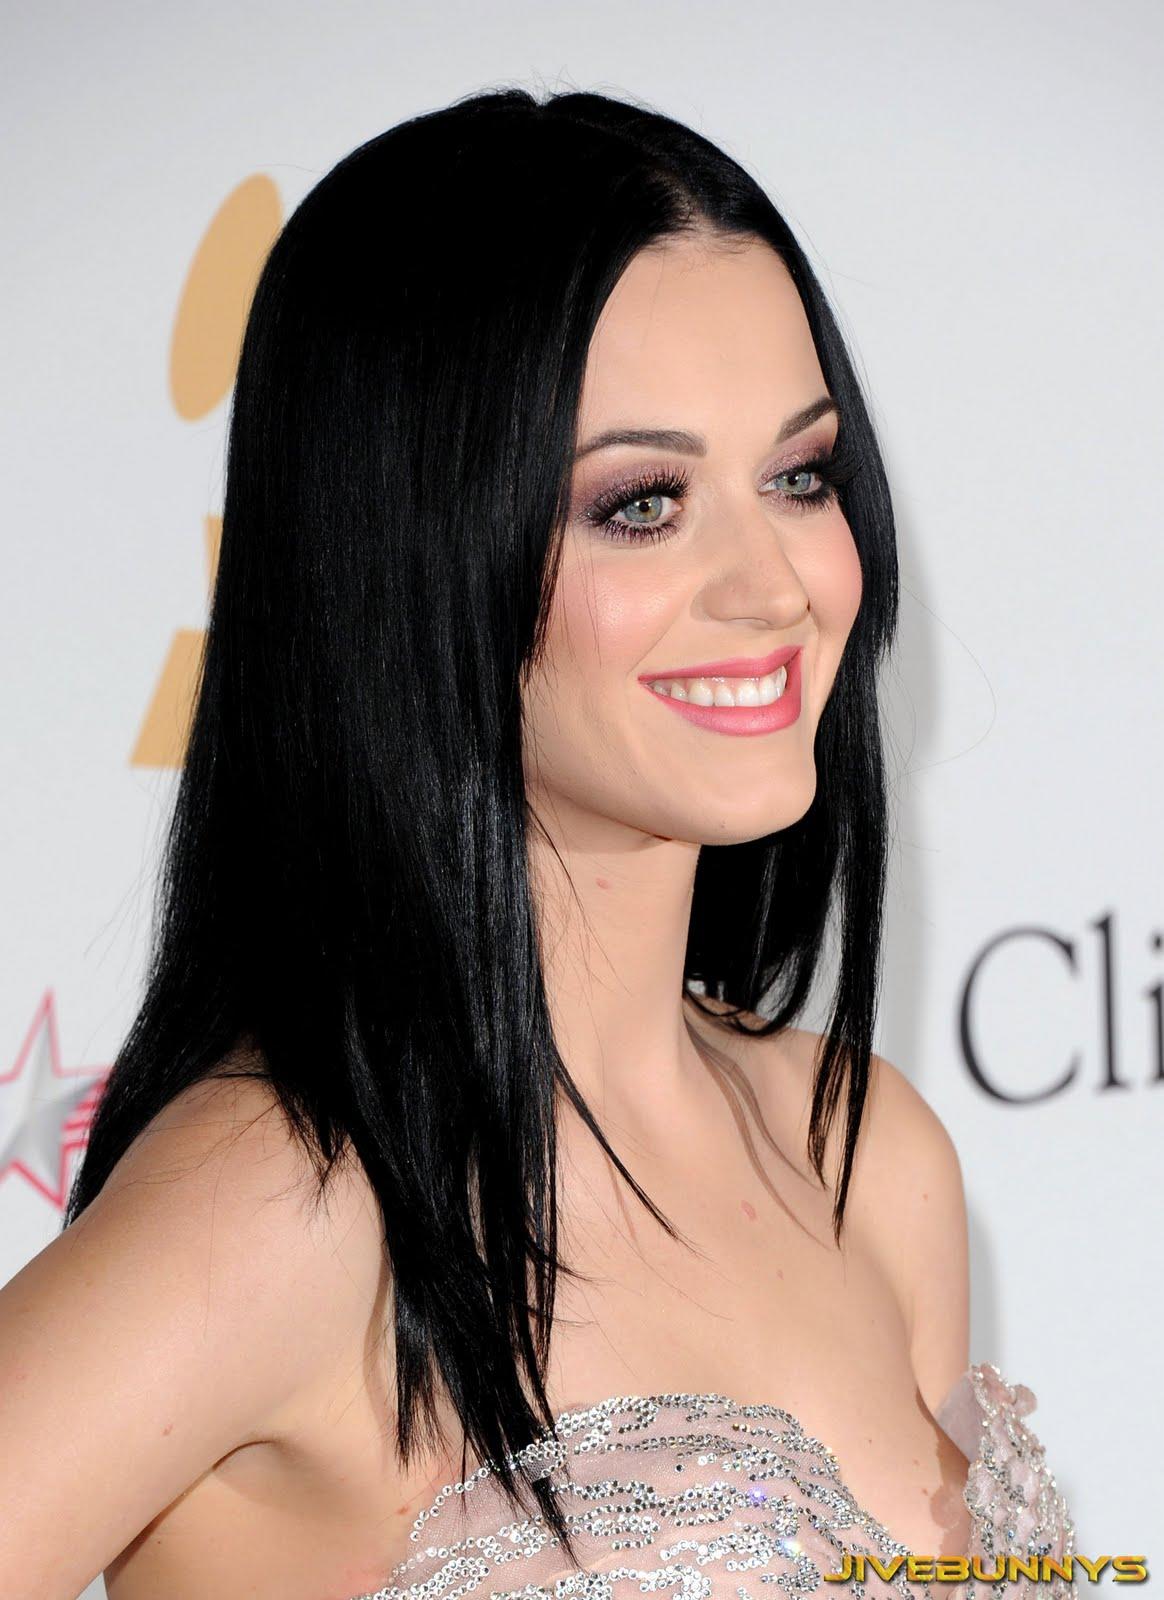 katy perry beauty singer - photo #18